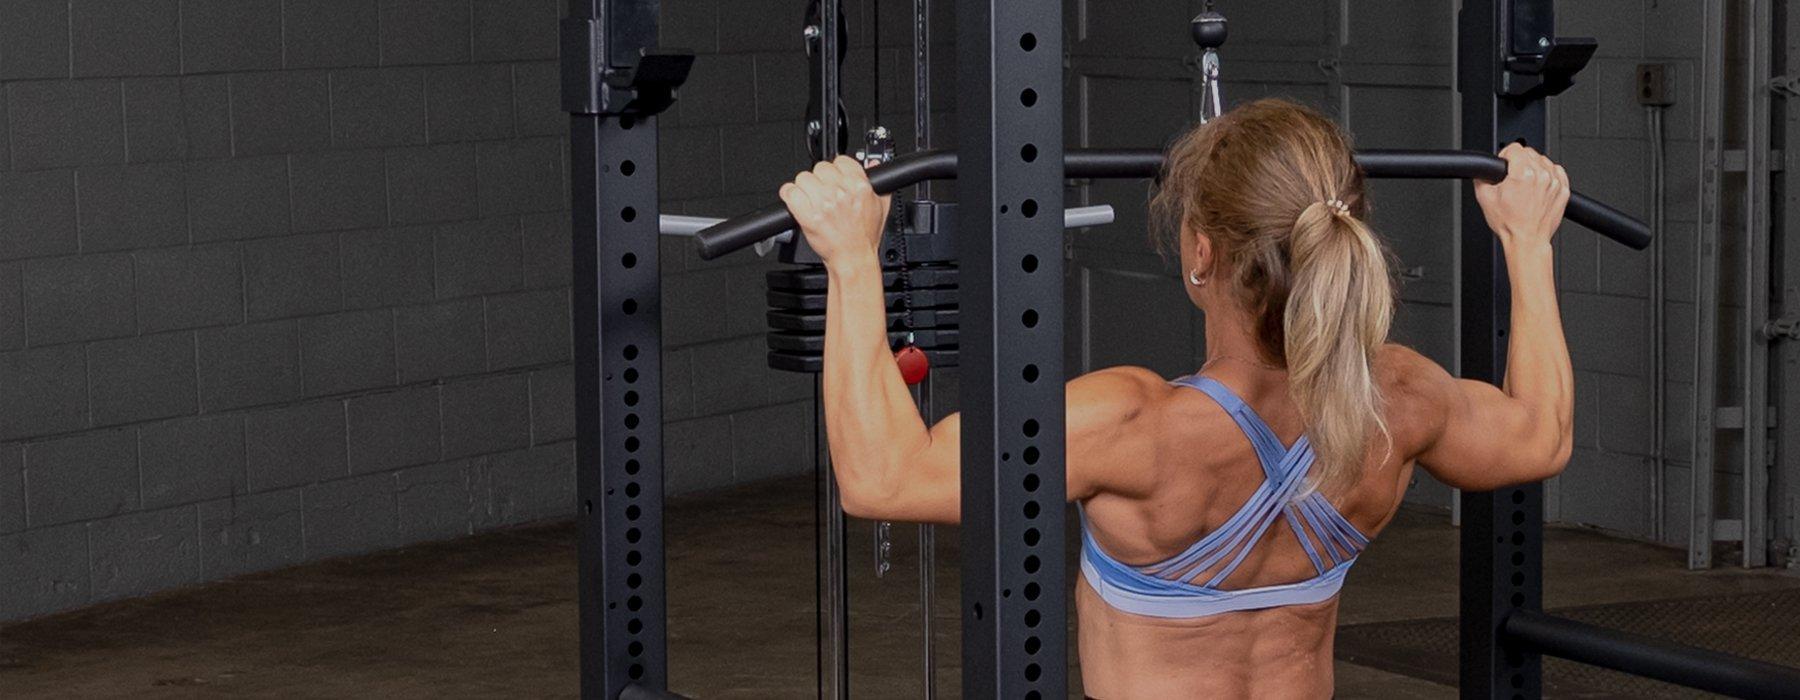 aparatura fitness